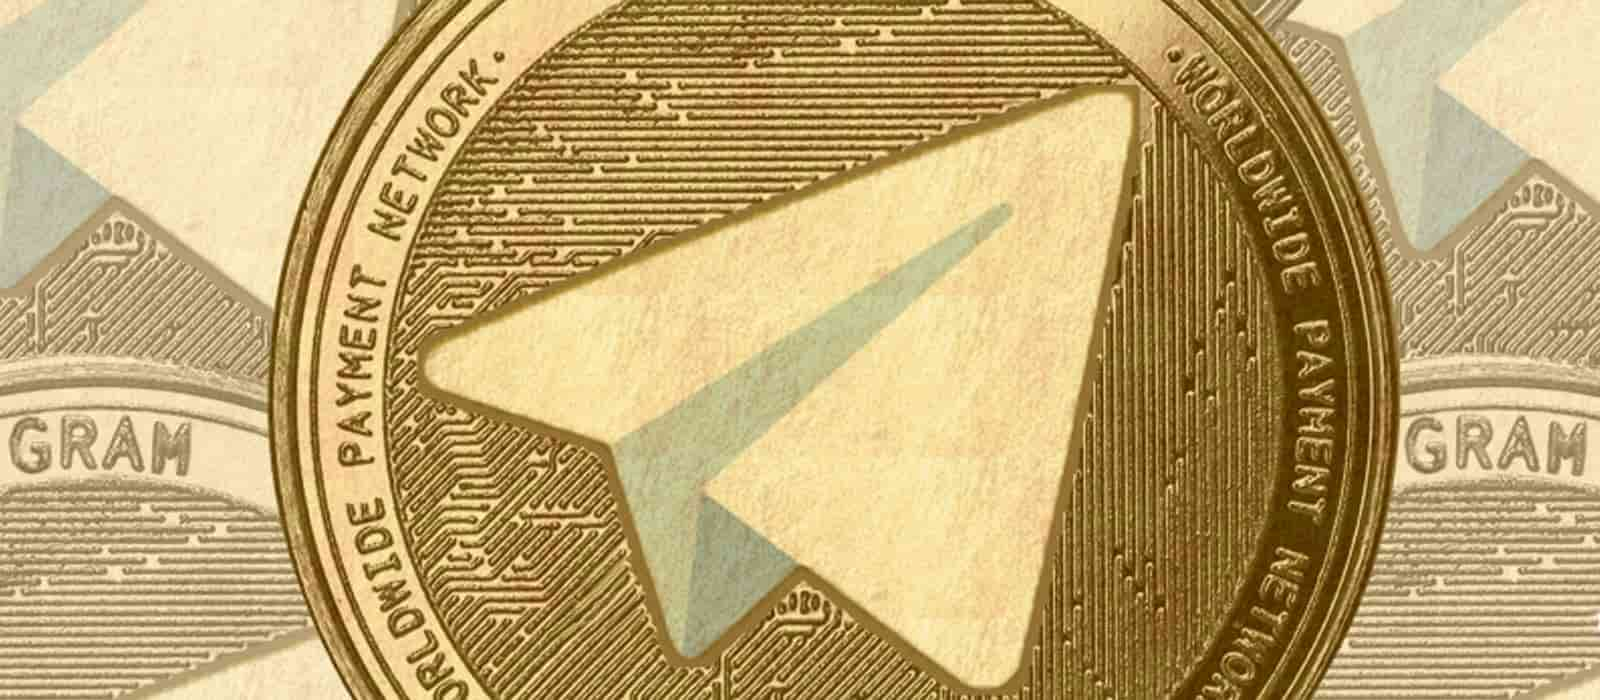 Telegram logo on a yellow coin